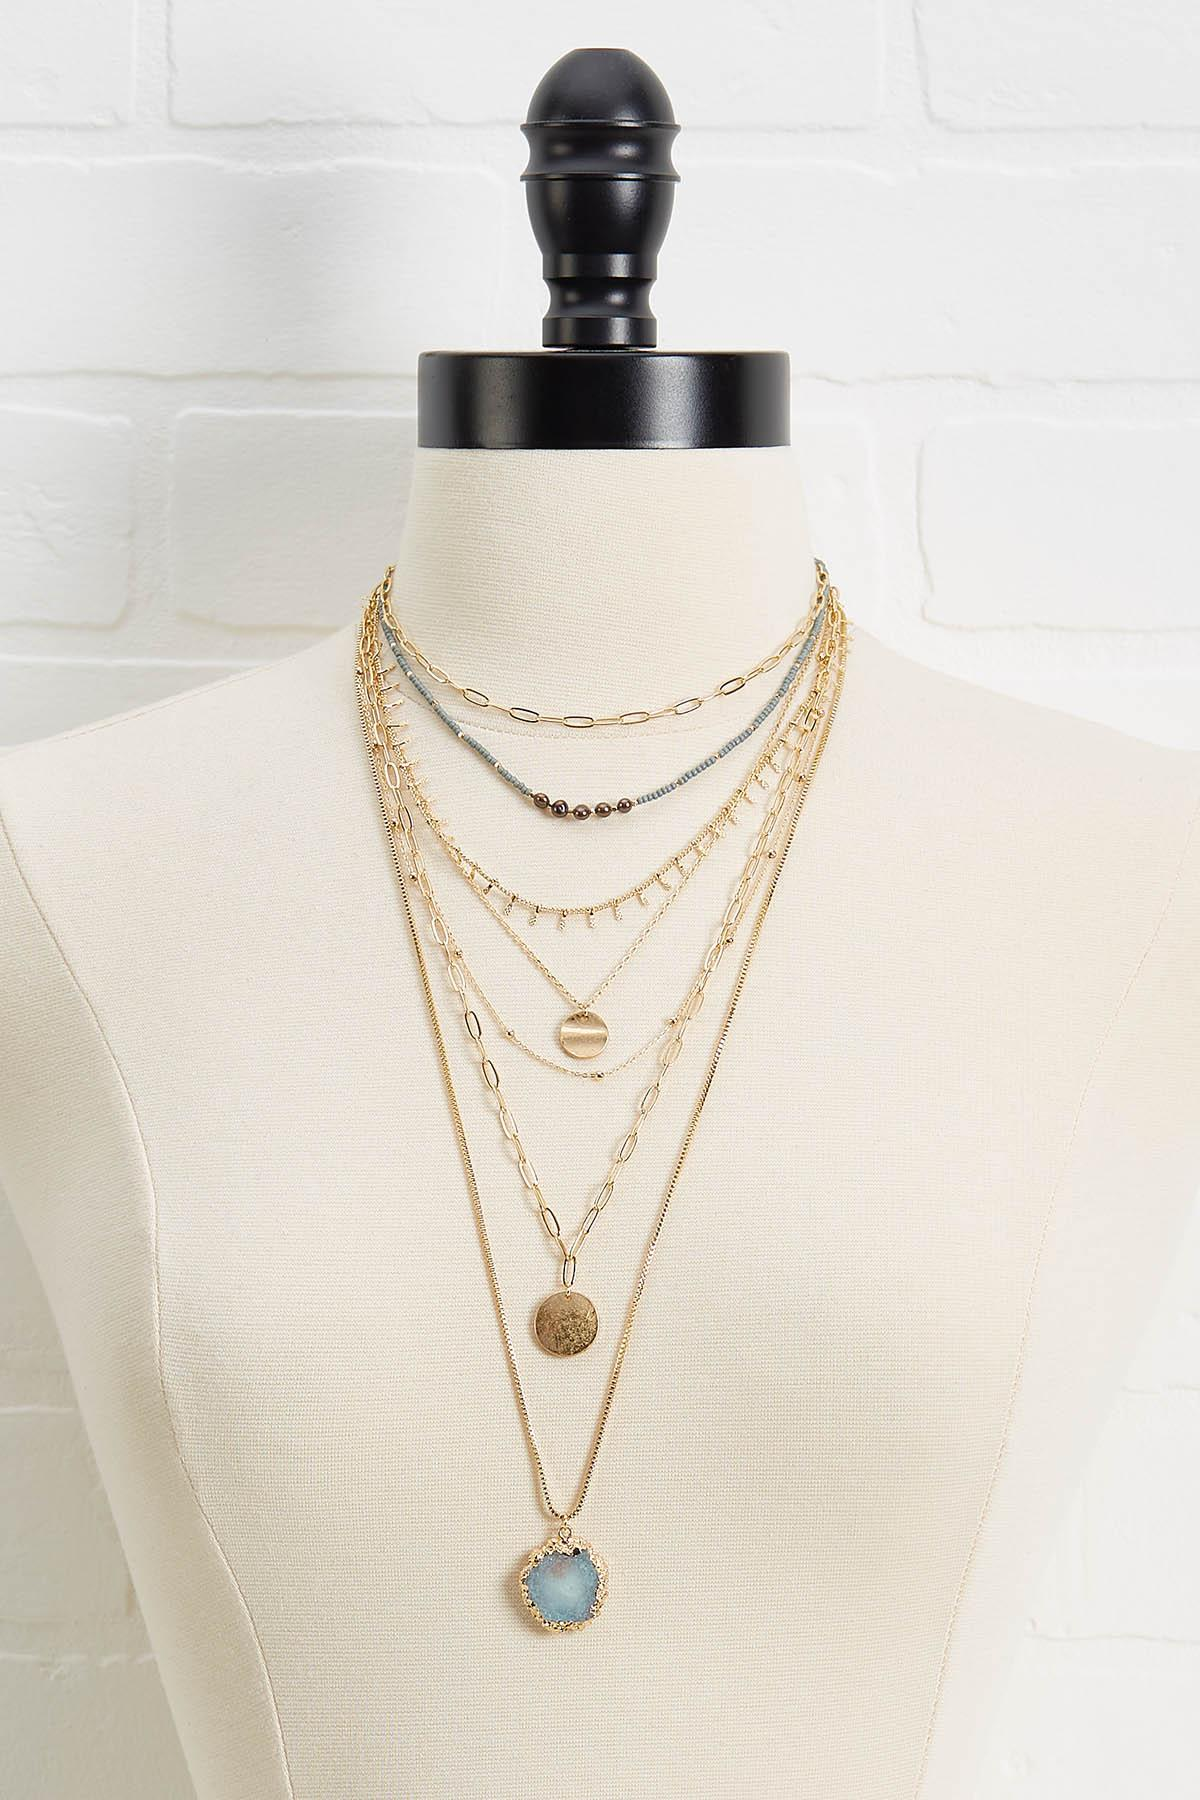 Delicate Agate Necklace